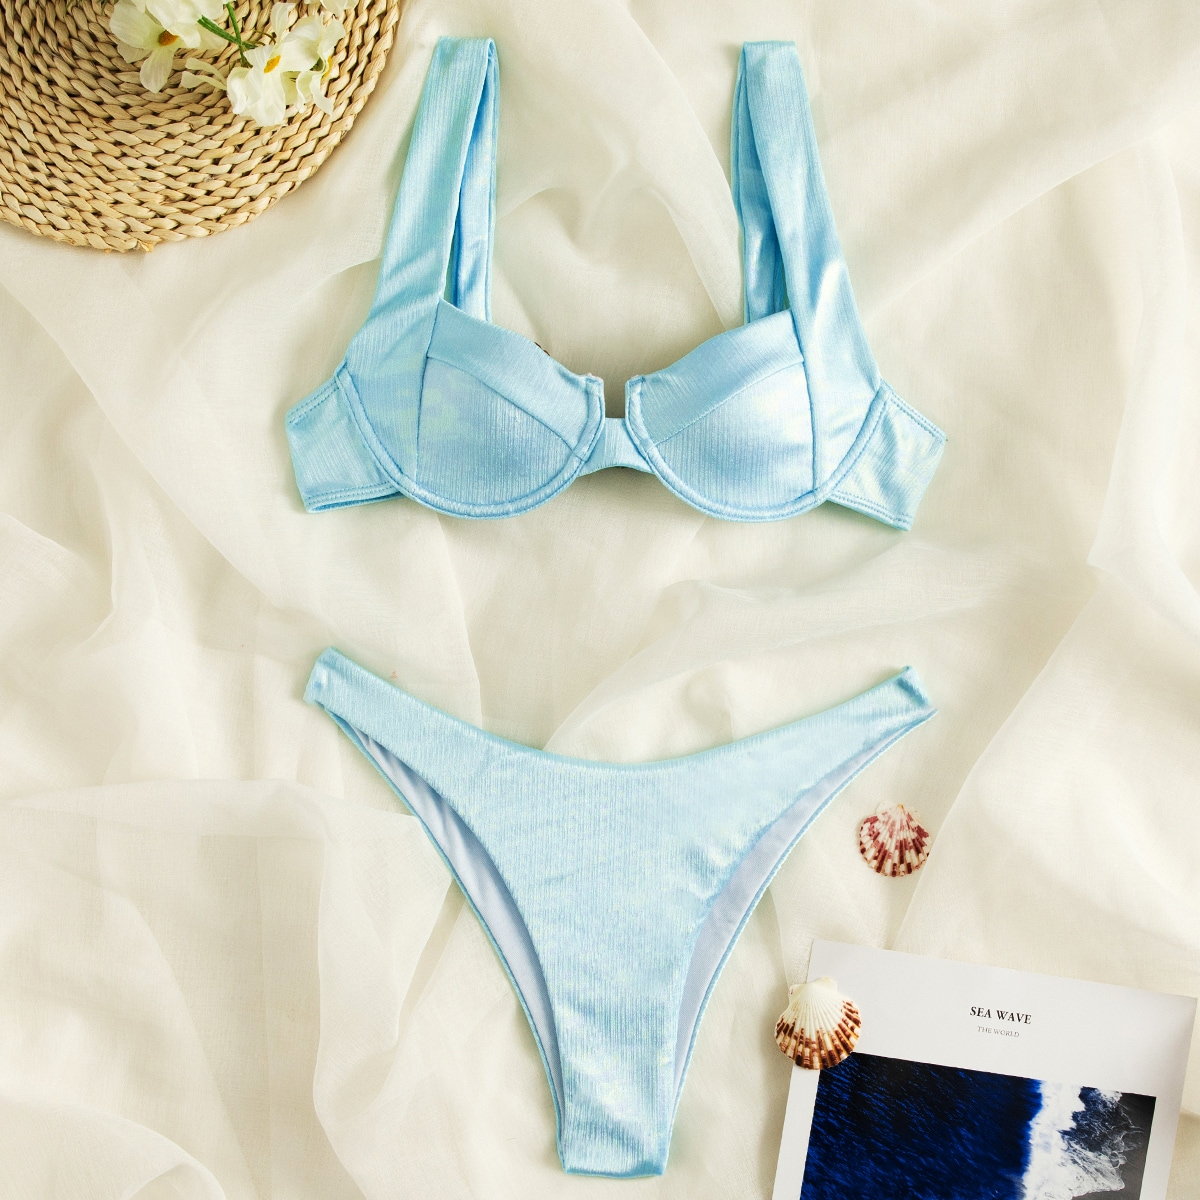 Push Up Underwire Bikini Swimsuit, SHEIN  - buy with discount